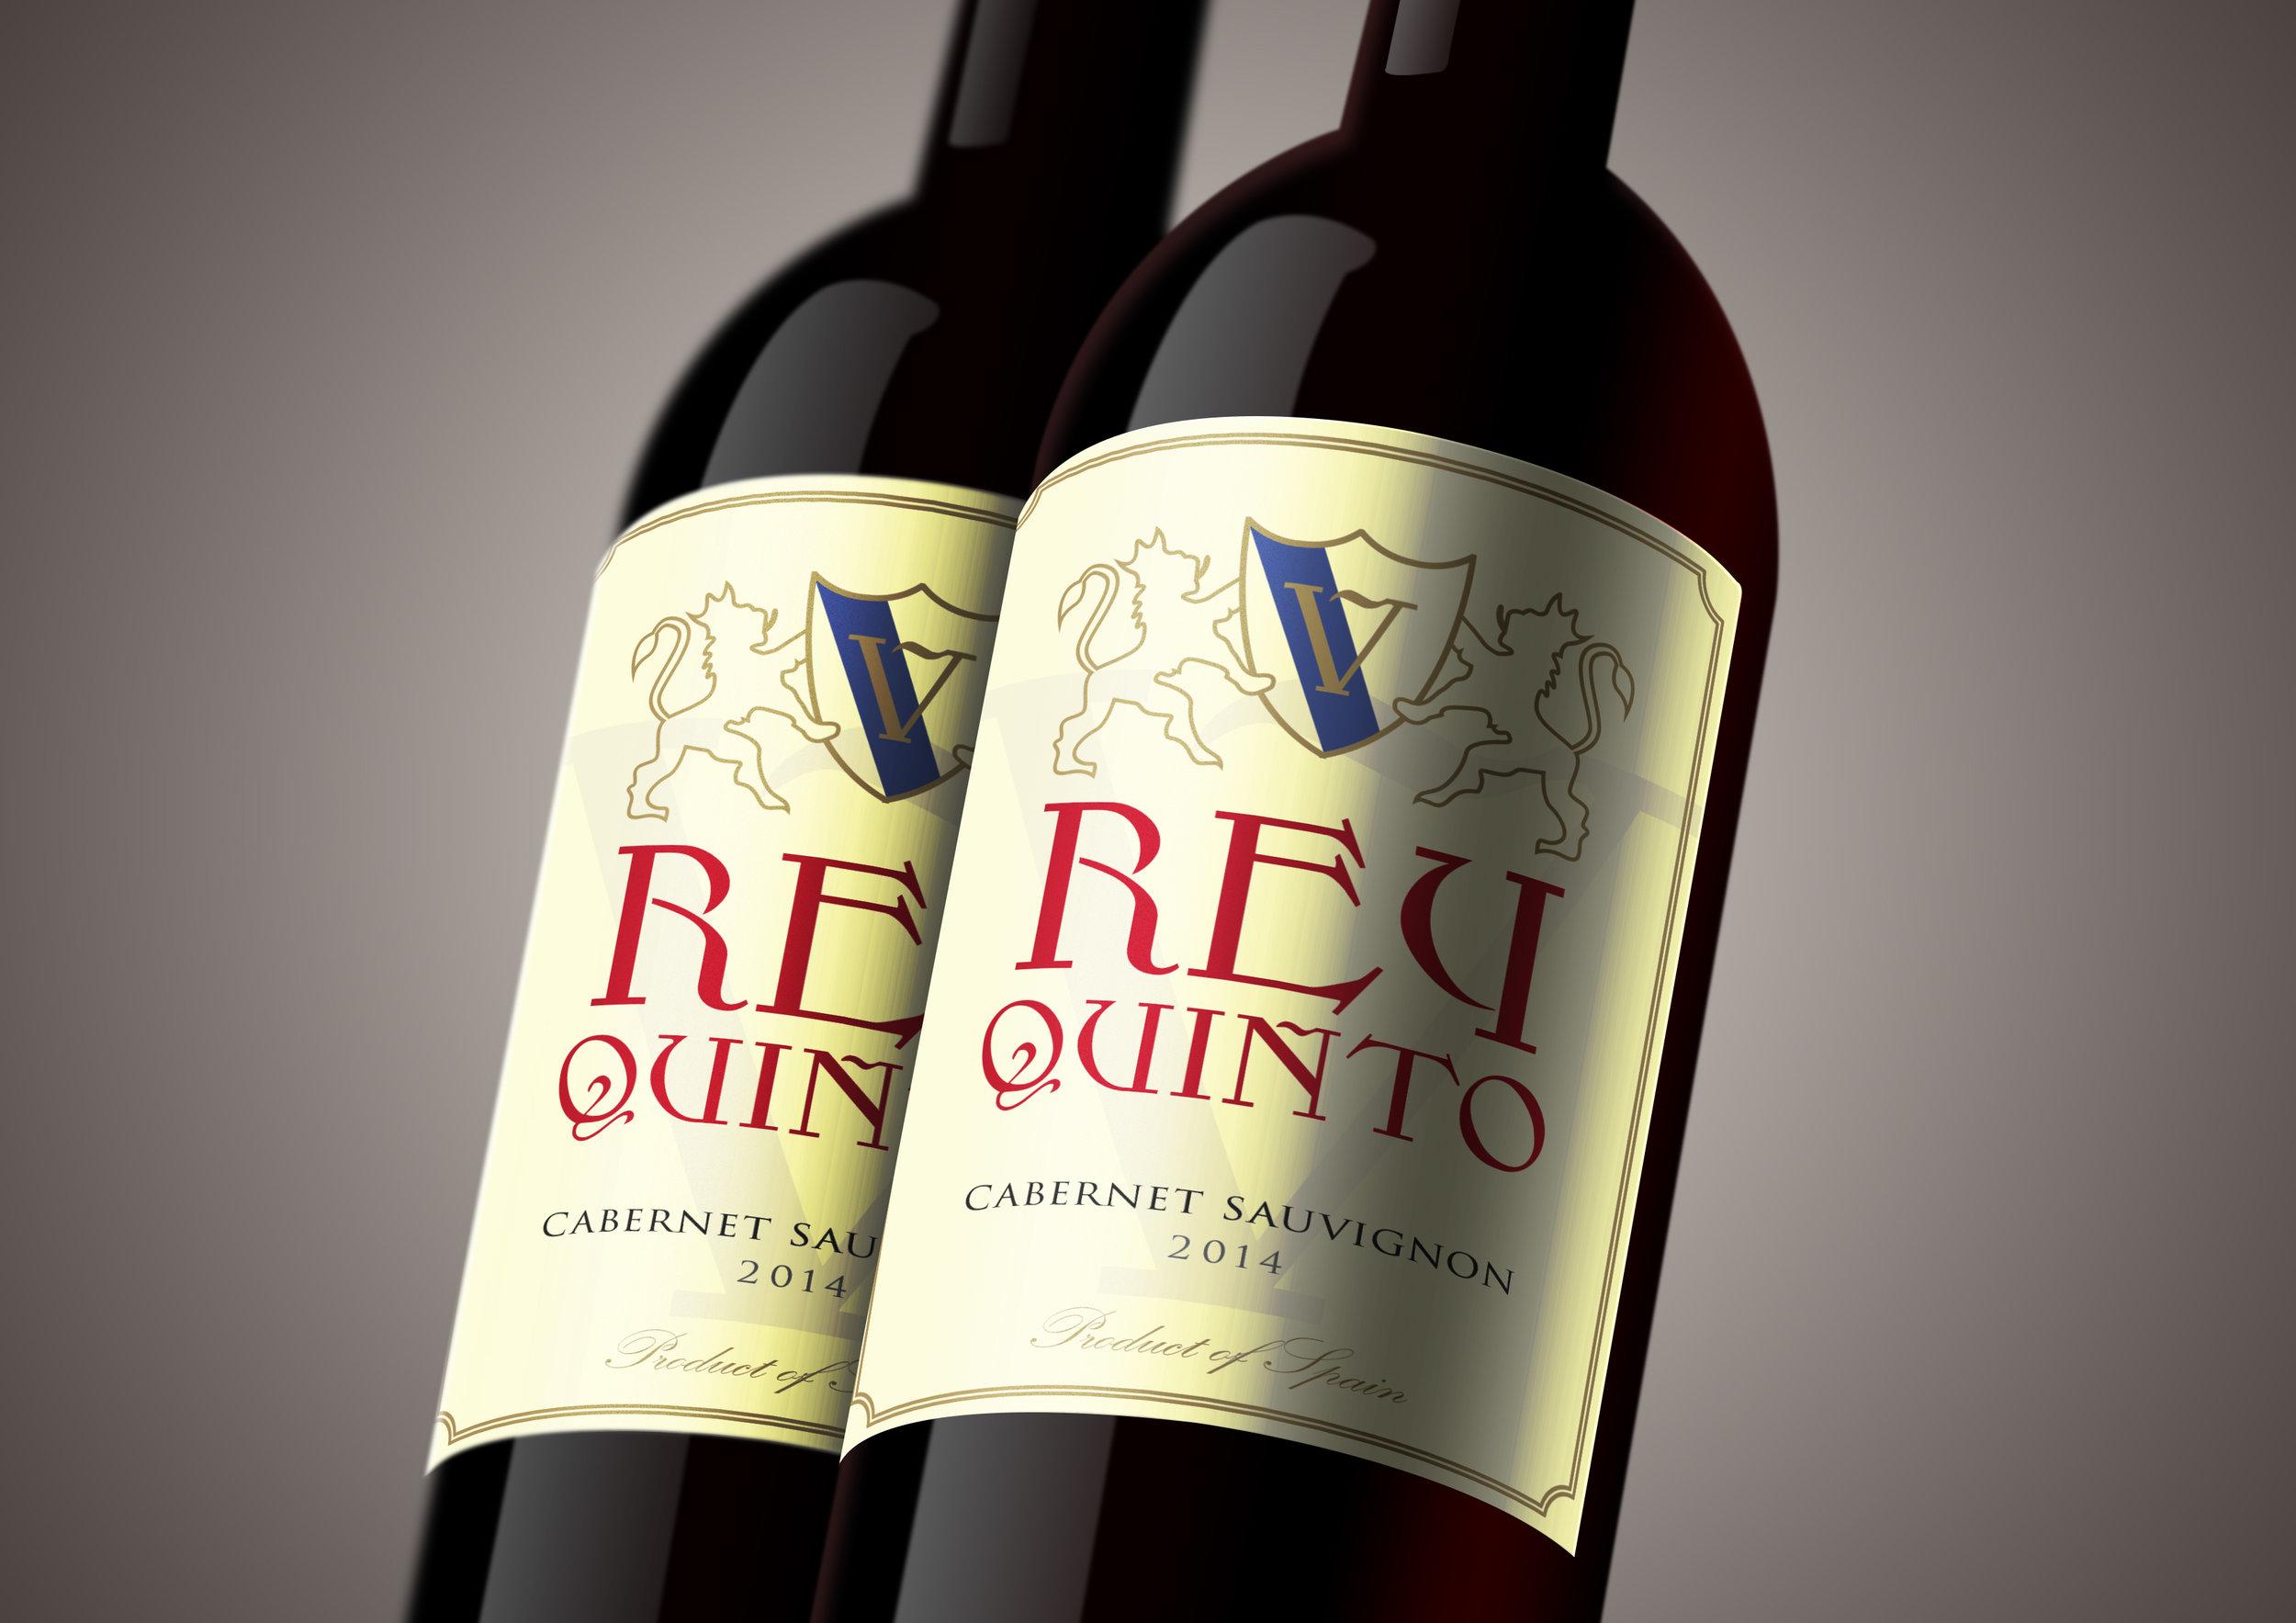 Rey Quinto 2 bottle shot.jpg